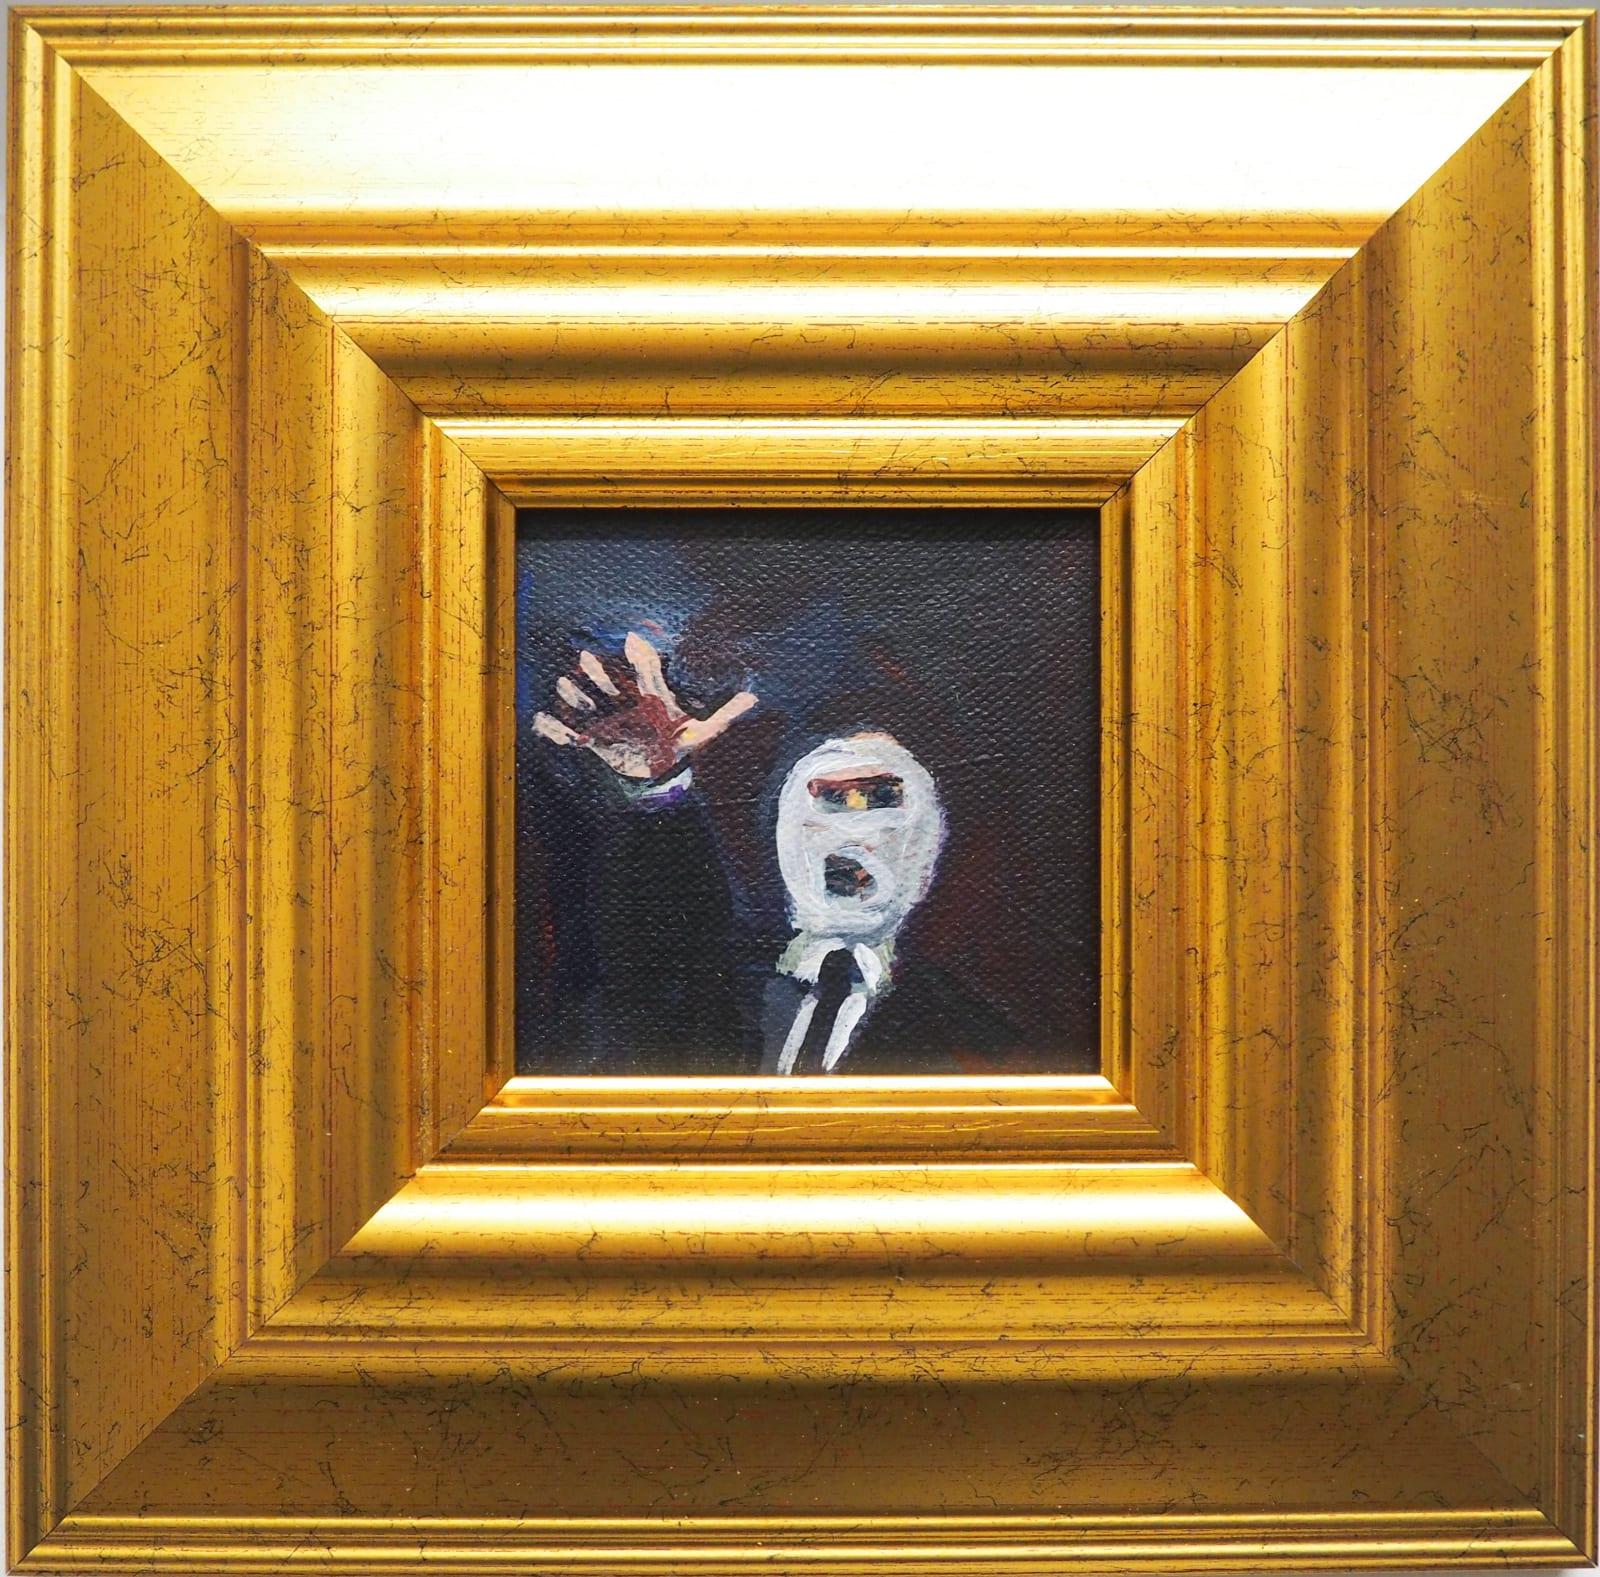 Yassine Balbzioui, between fingers, 2018 Oil on canvas 25.5 x 25.2 cm (framed)